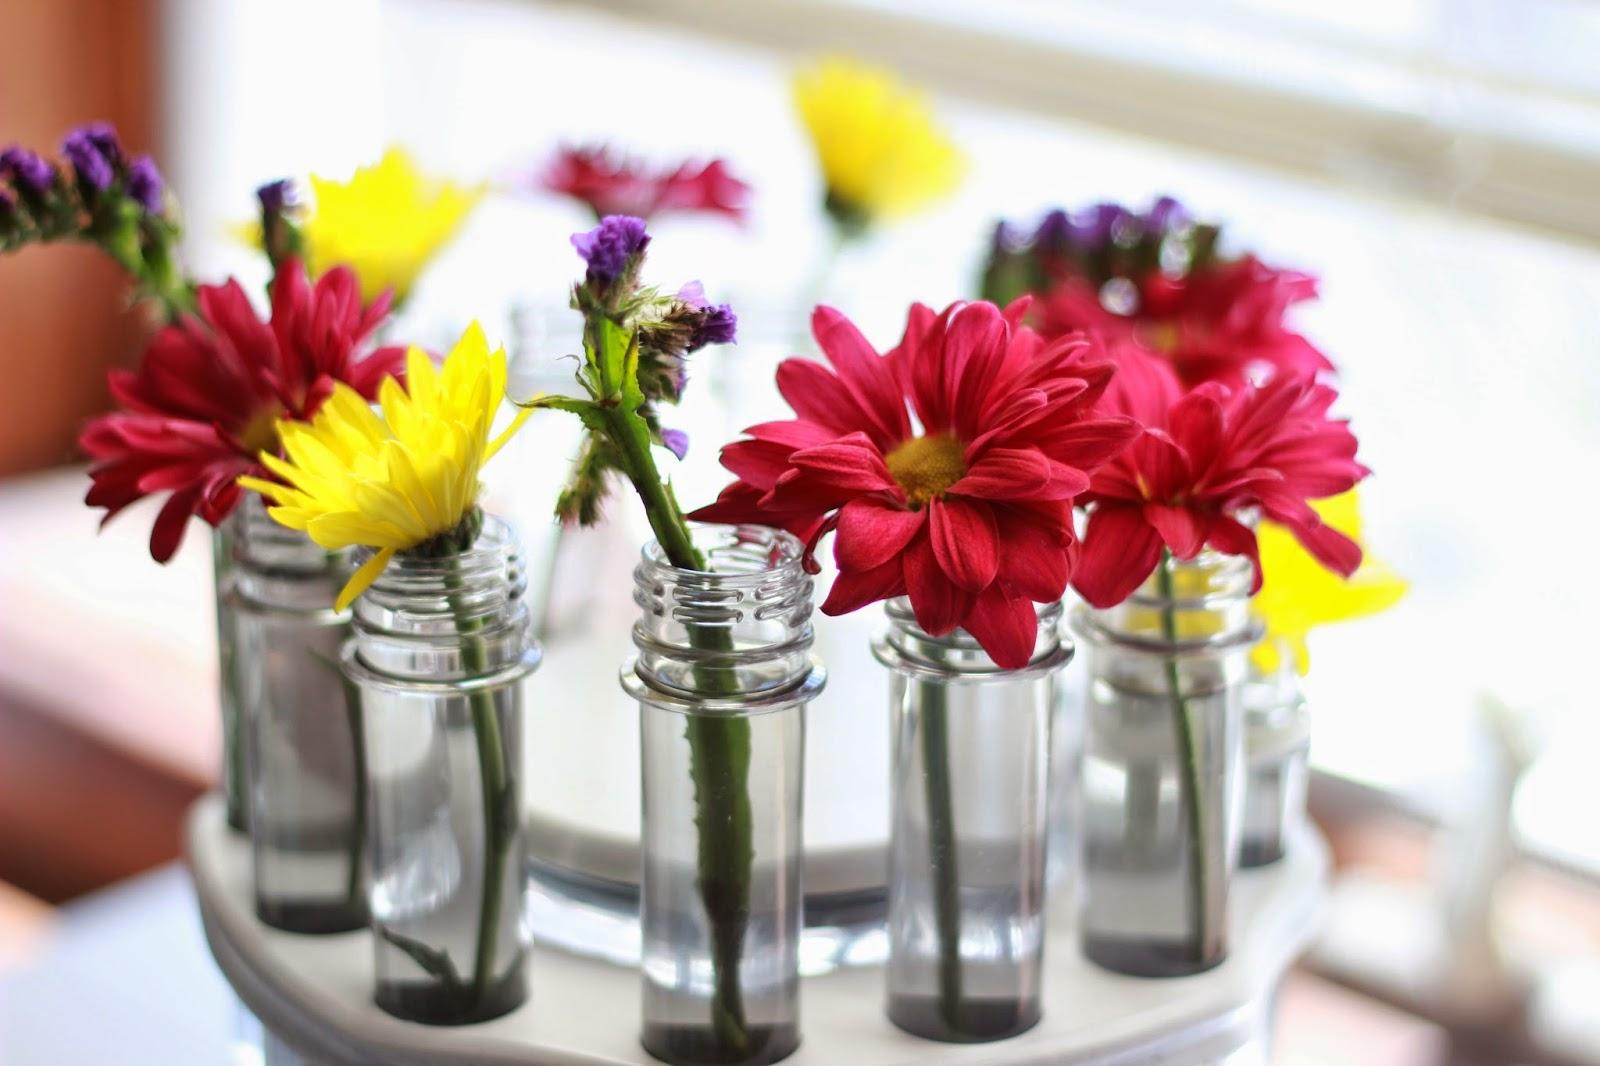 Diy test tube flower rack craftbnb dinas daystest tube flower vase reviewsmspy